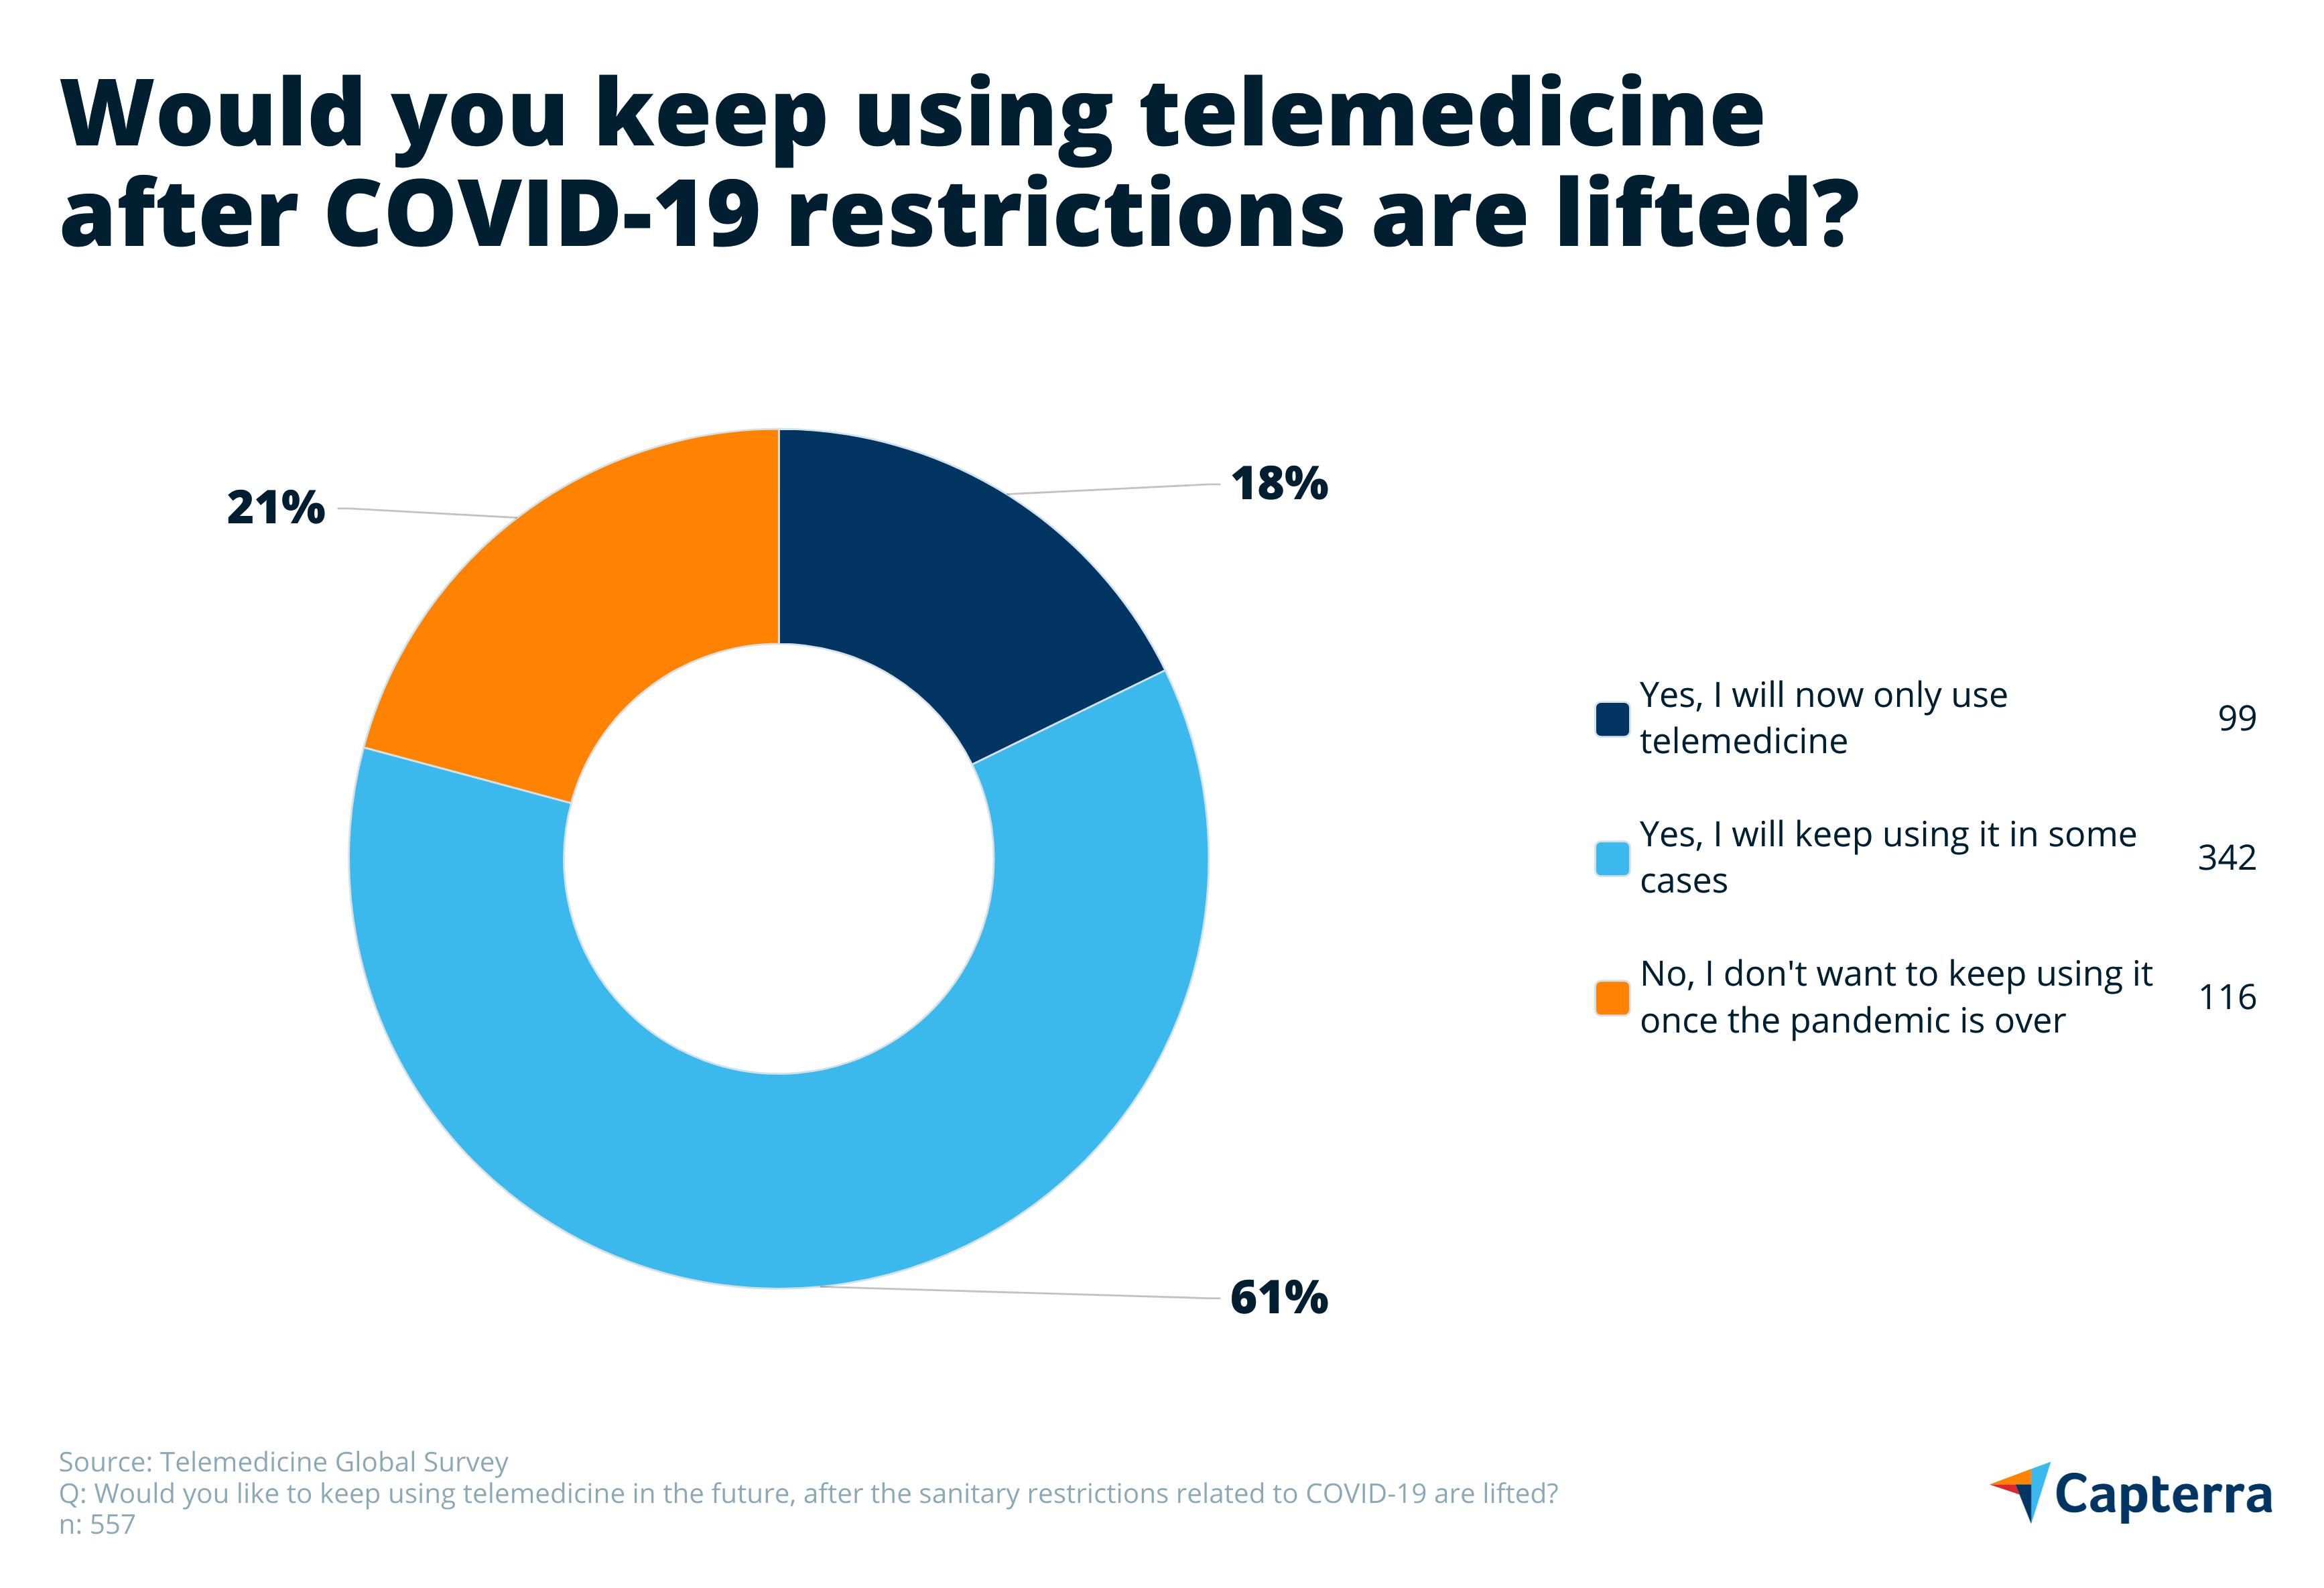 Continued use of telemedicine UK